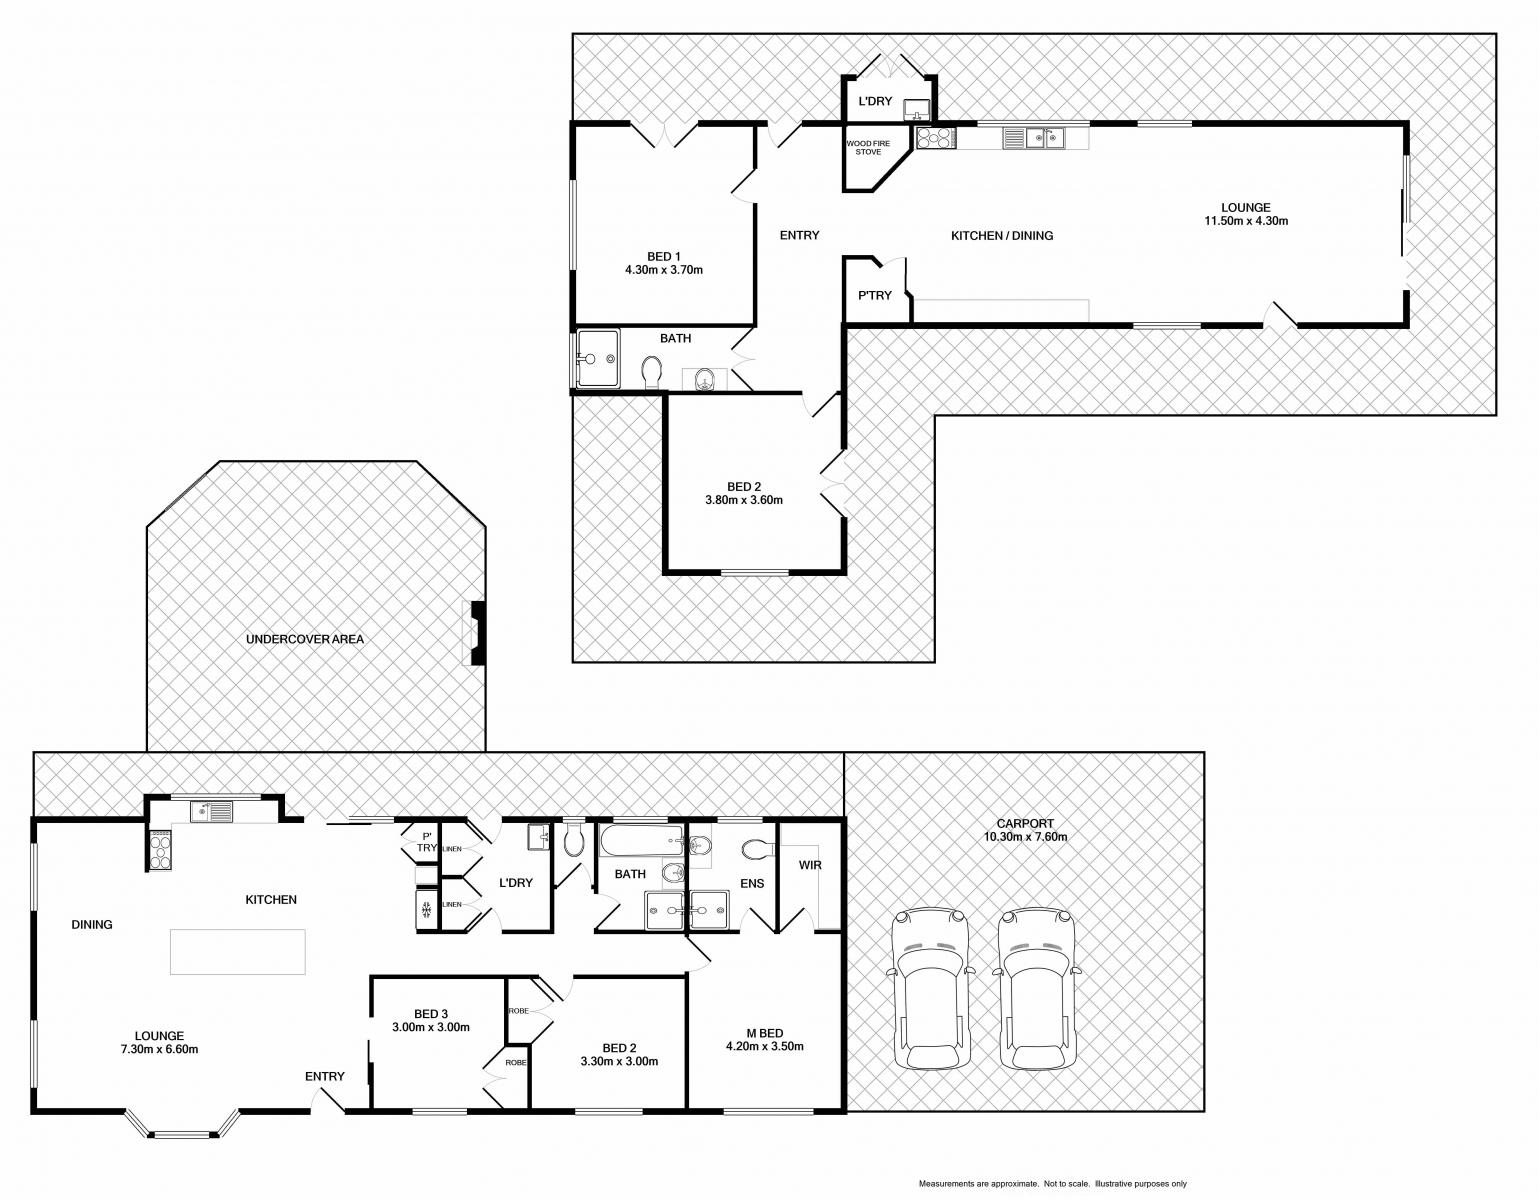 https://assets.boxdice.com.au/devlin/listings/442/405acb1c.jpg